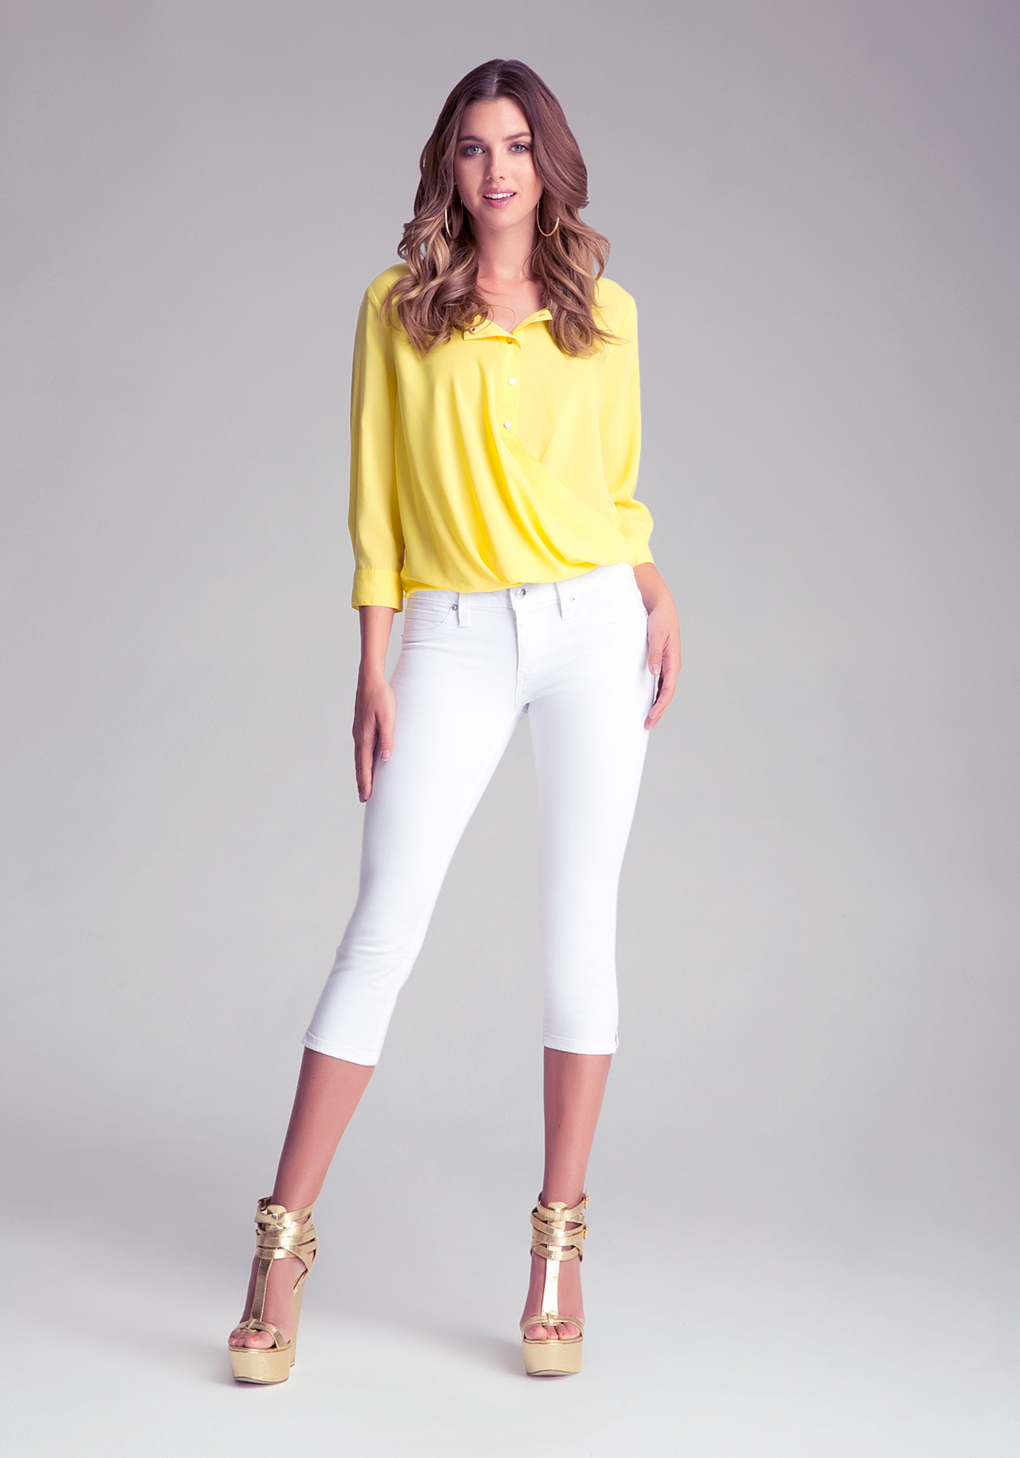 Bebe Side Slit Capri Jeans in White | Lyst